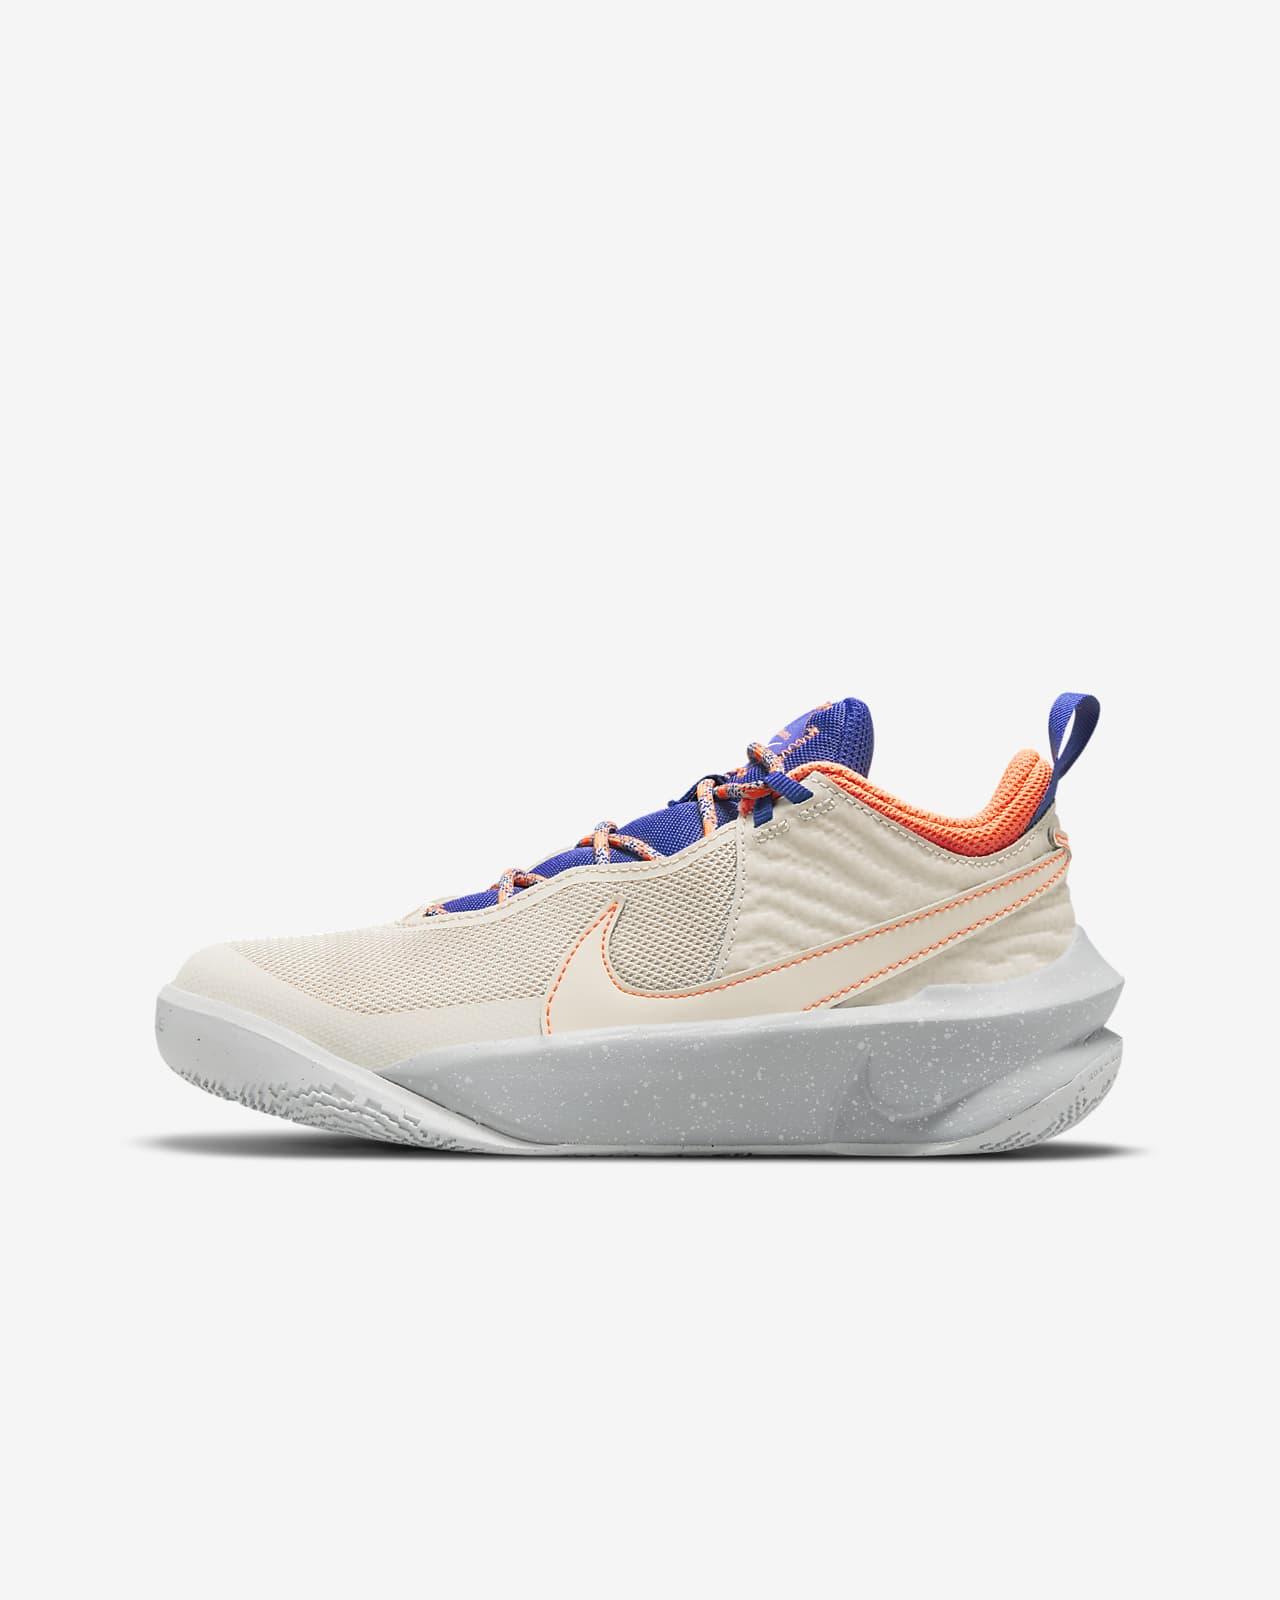 Nike Team Hustle D 10 SE Big Kids' Basketball Shoe